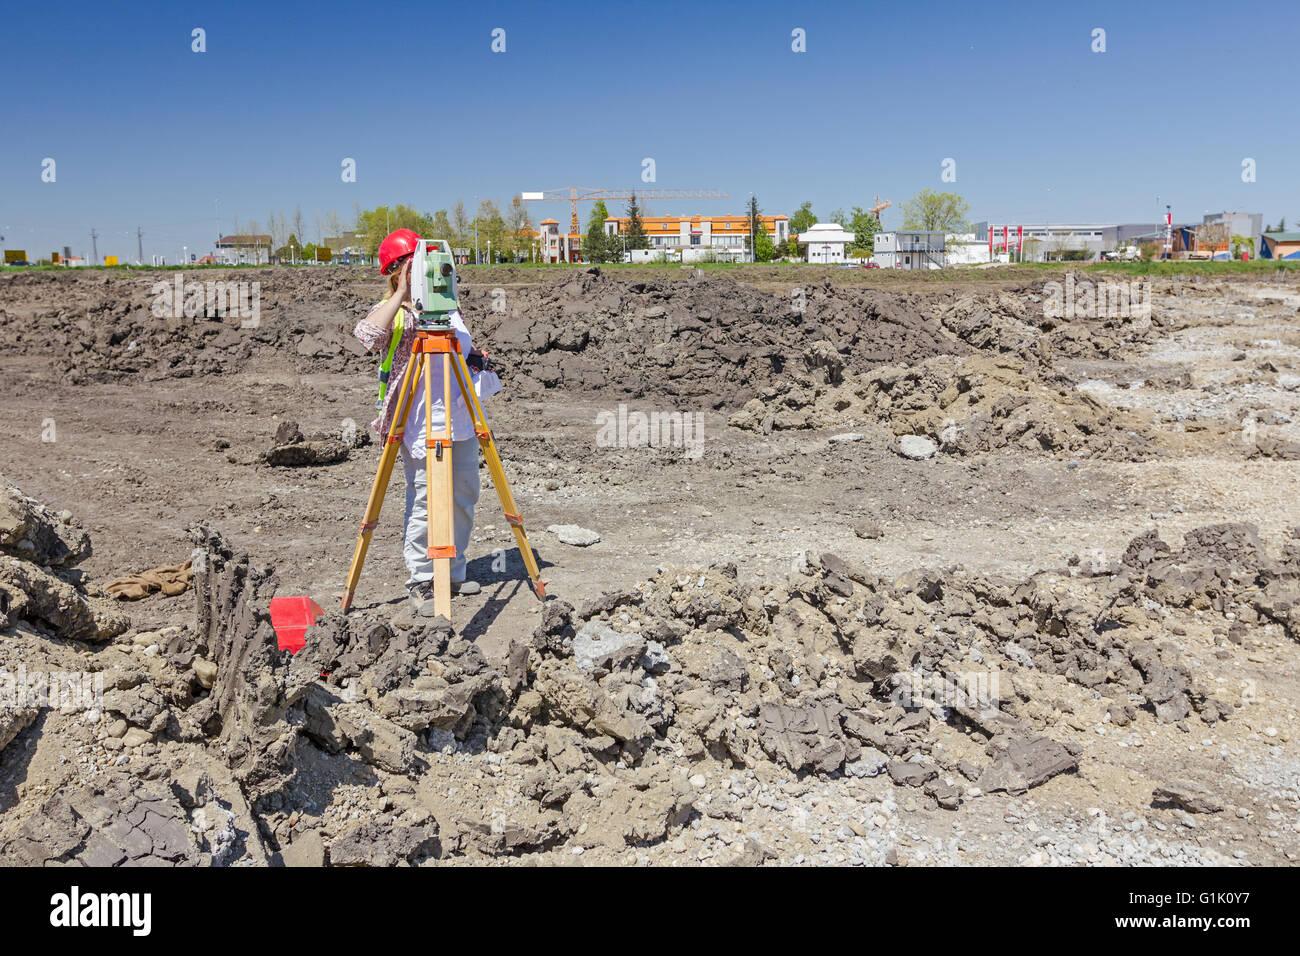 Woman surveying is measuring level on construction site. Surveyors ensure precise measurements. - Stock Image